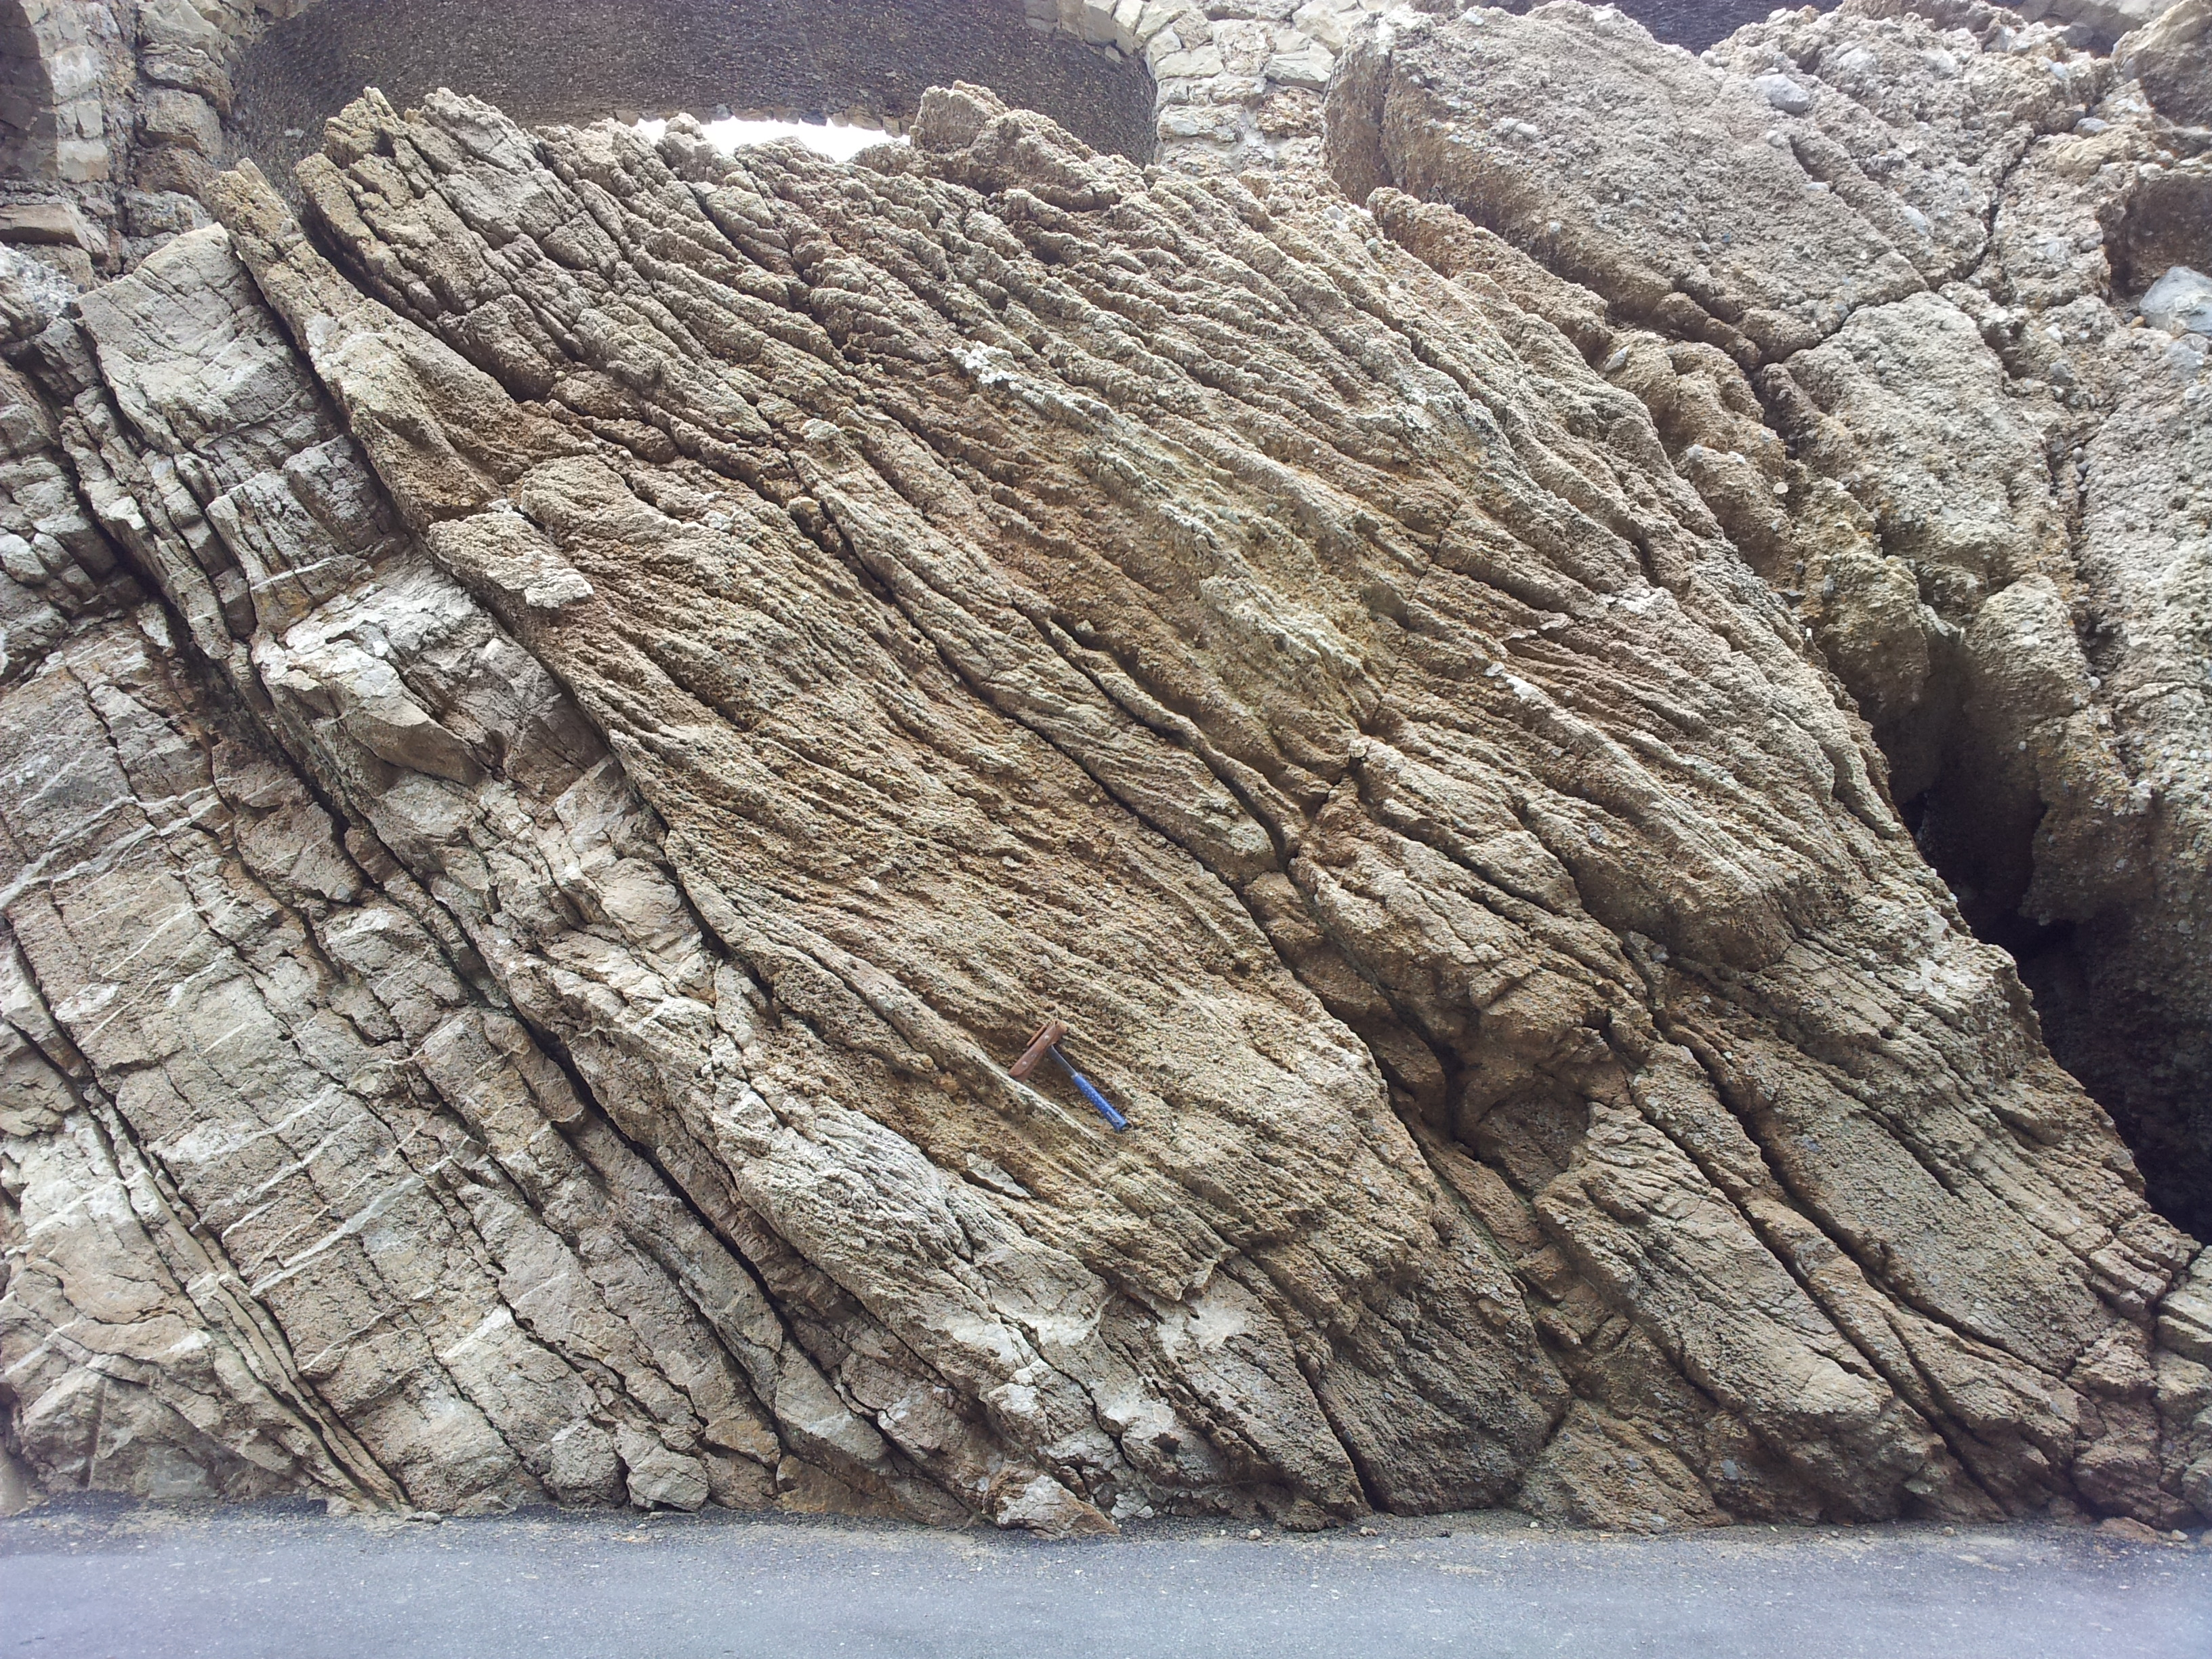 successione sedimentaria